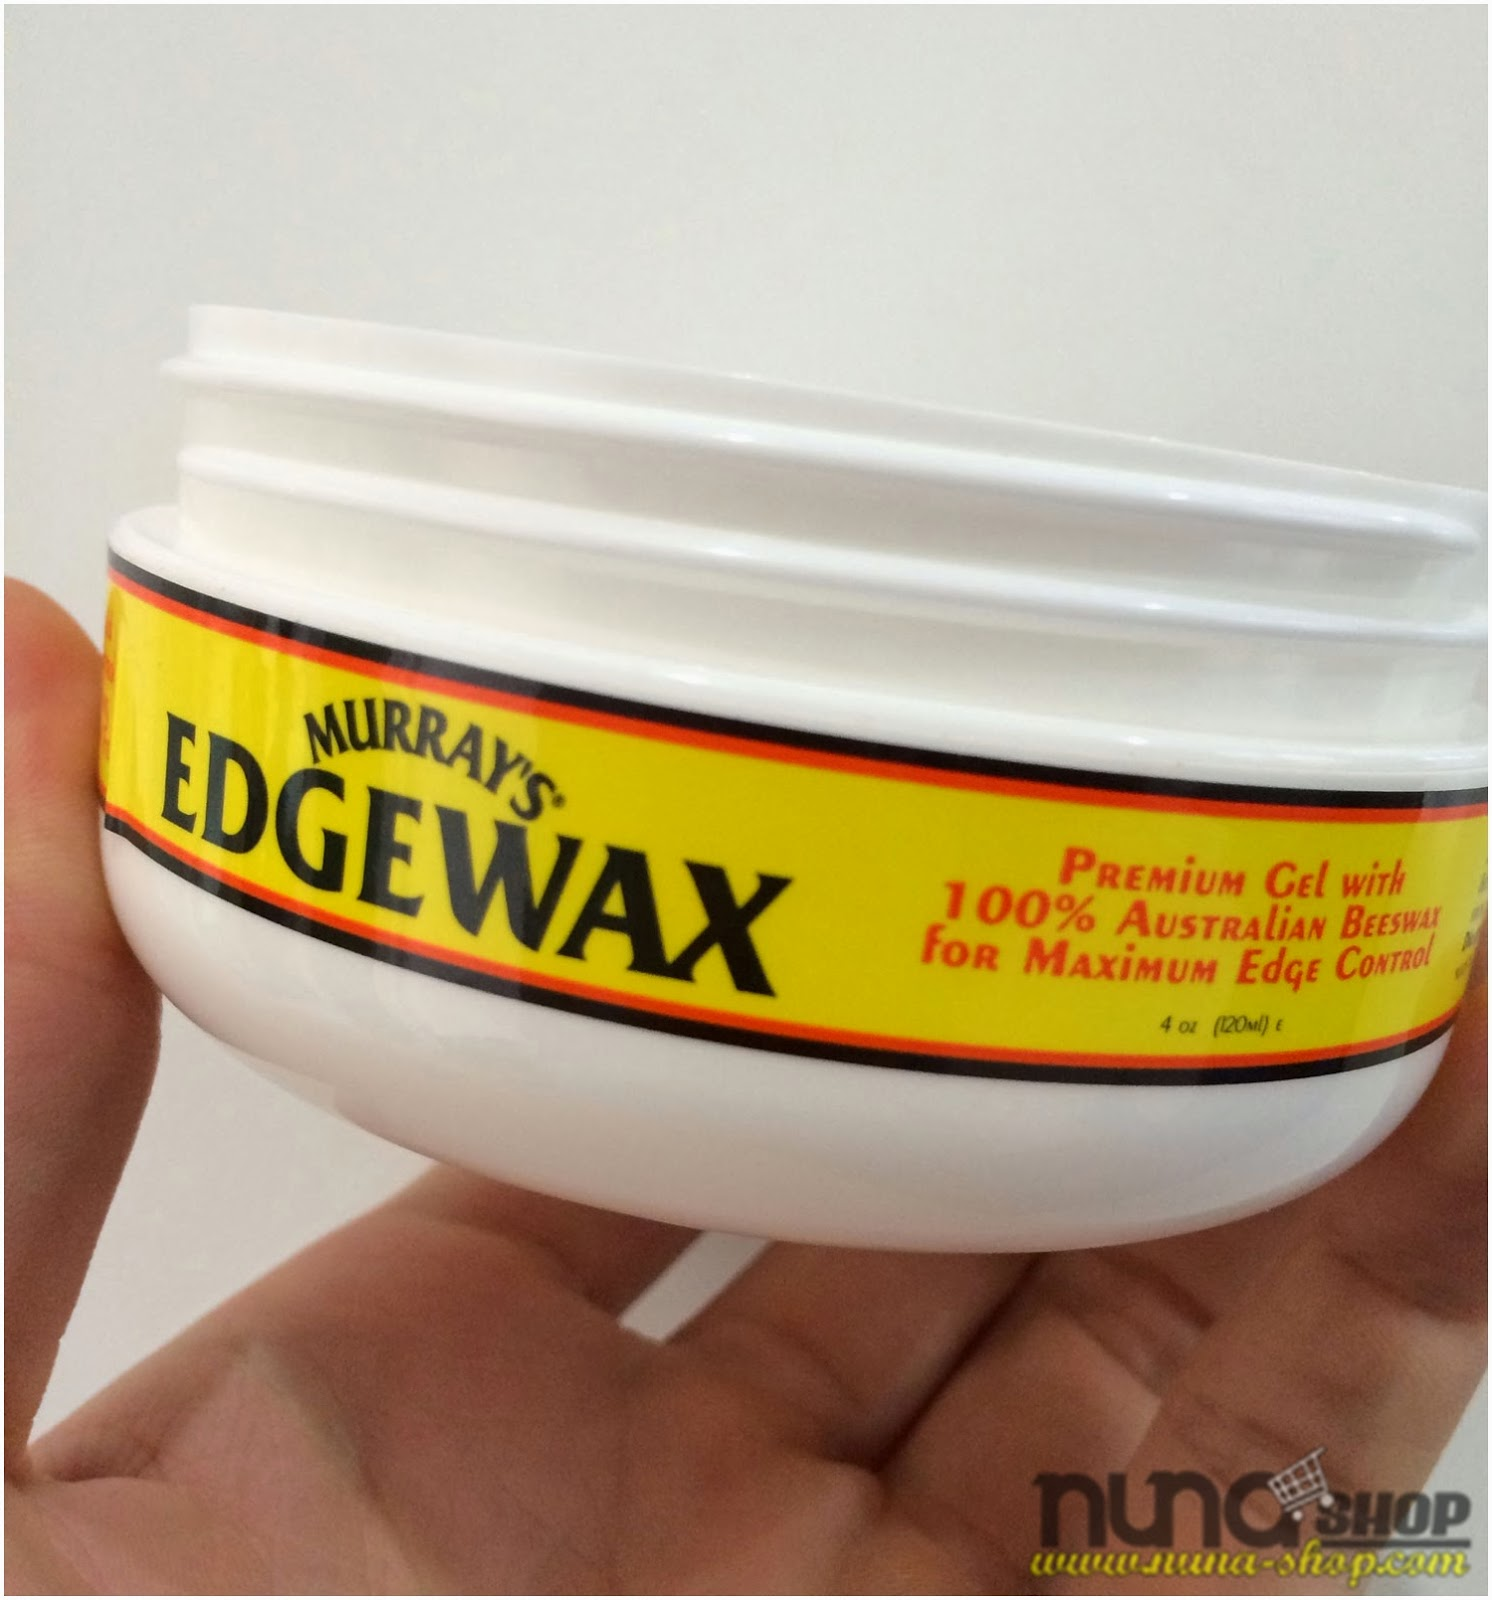 Edgewax - Waterbased Pomade Murray's